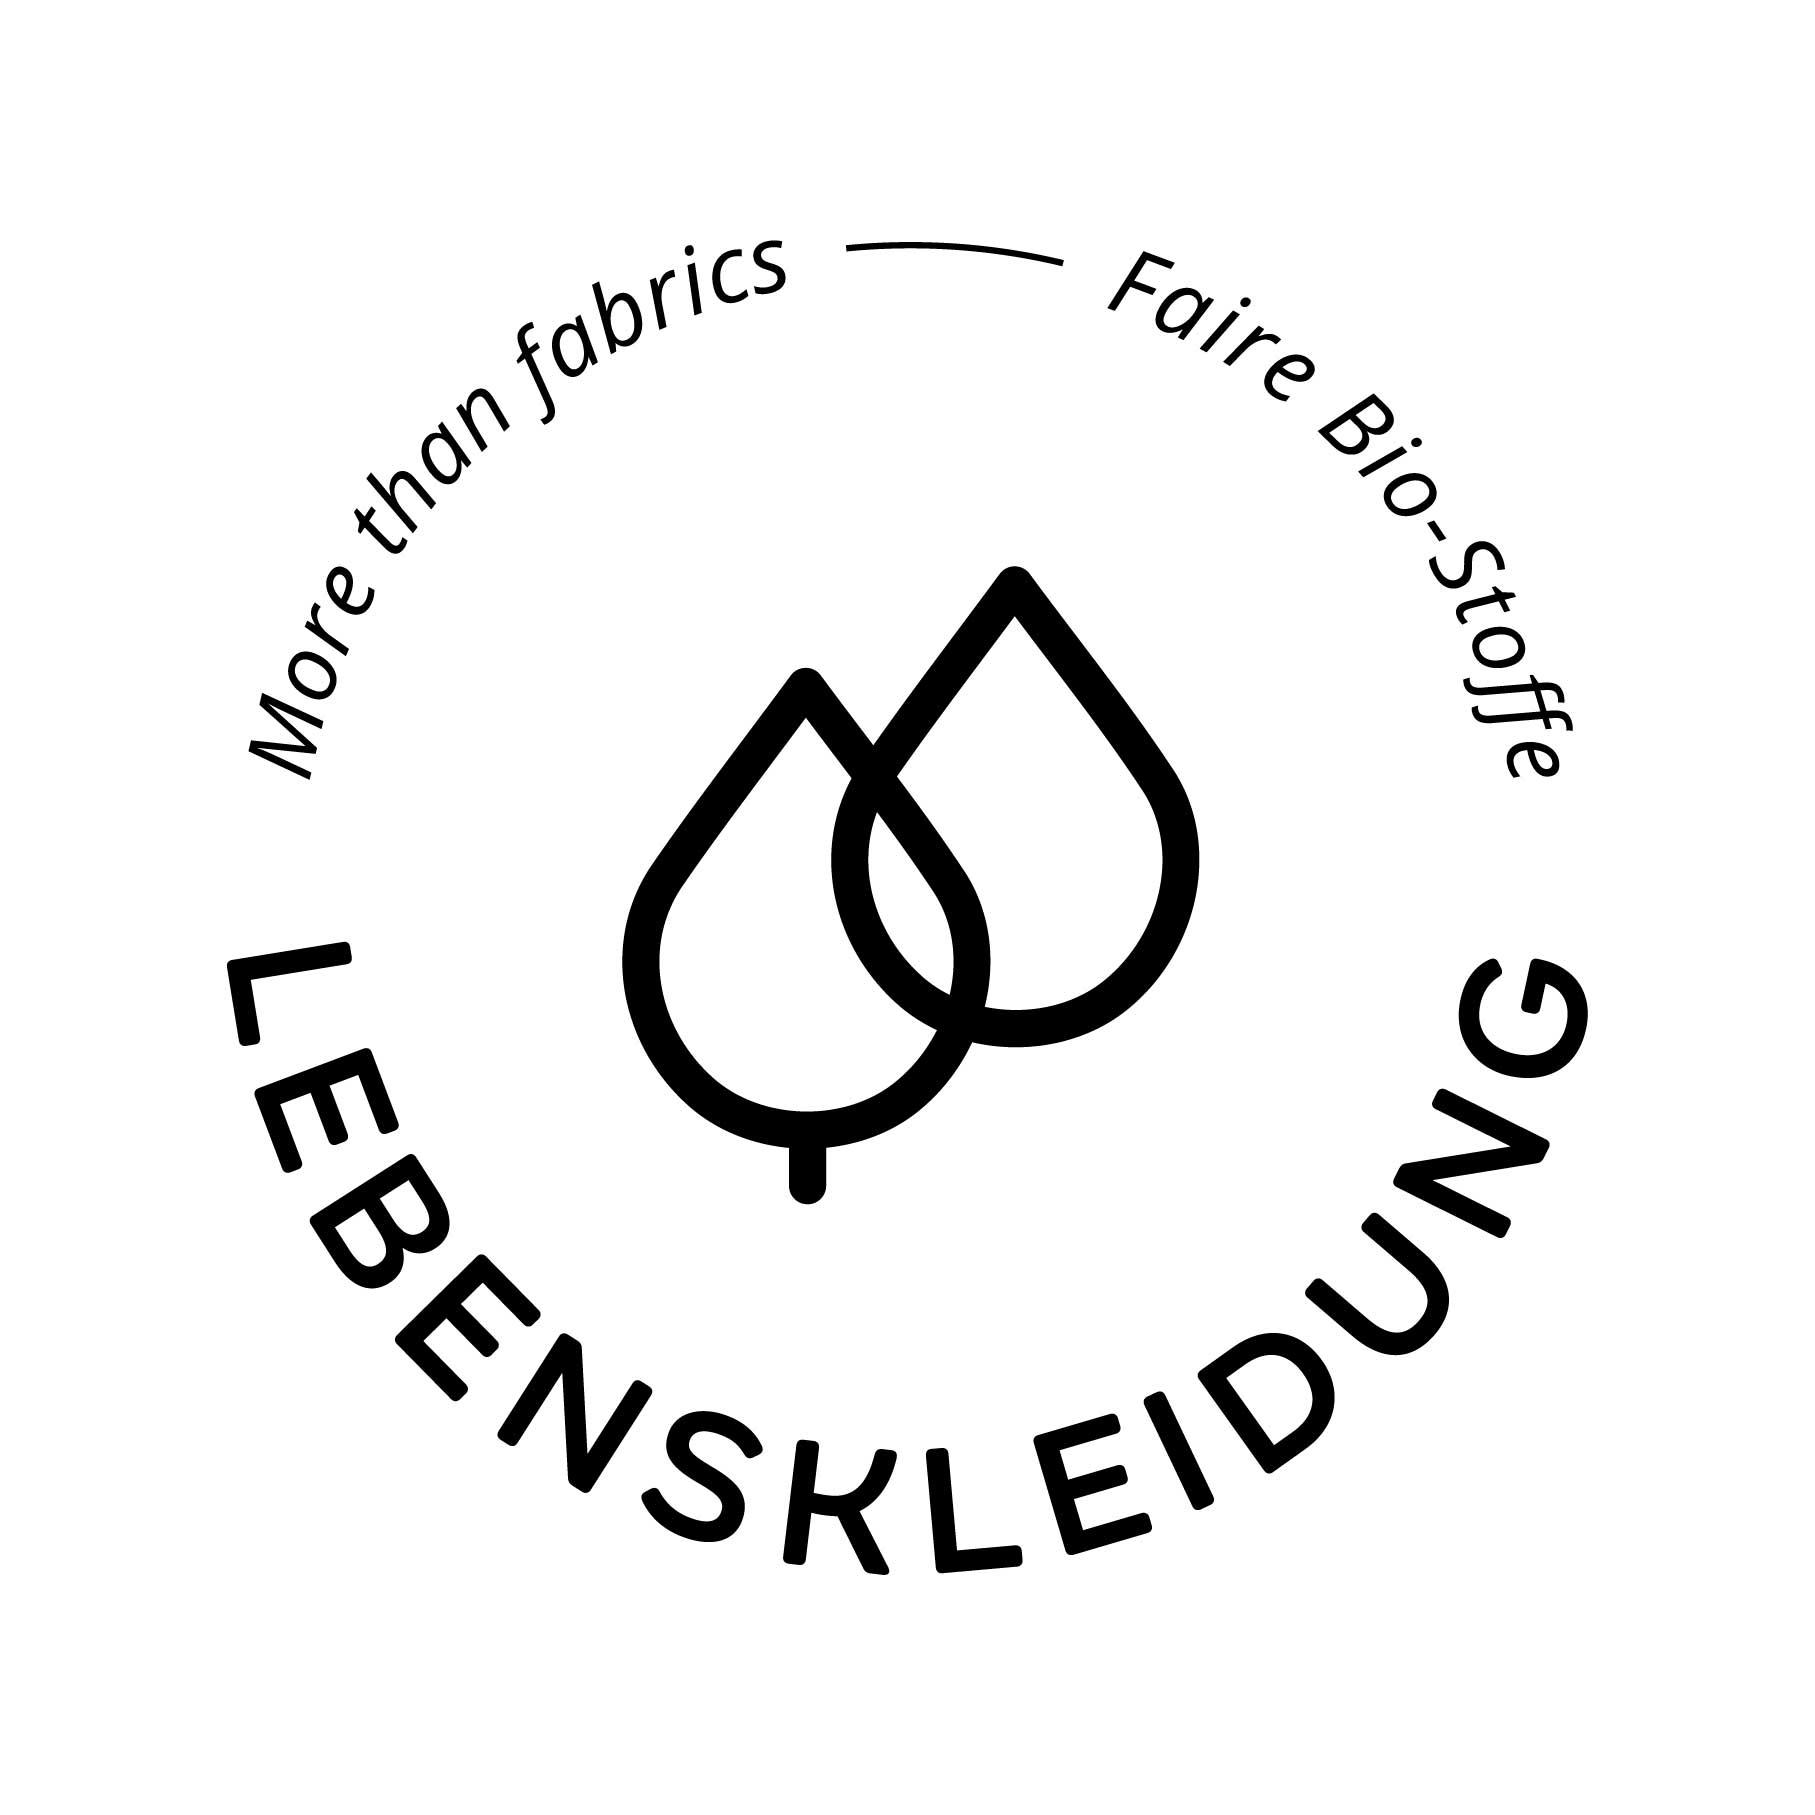 Tela orgánica Banda de goma elástica - 59% Bio Baumwolle 41% Naturkautschuk -  adecuado para telas de peso ligero a medio - 9,5 mm -  Ecru  - 100 Metros